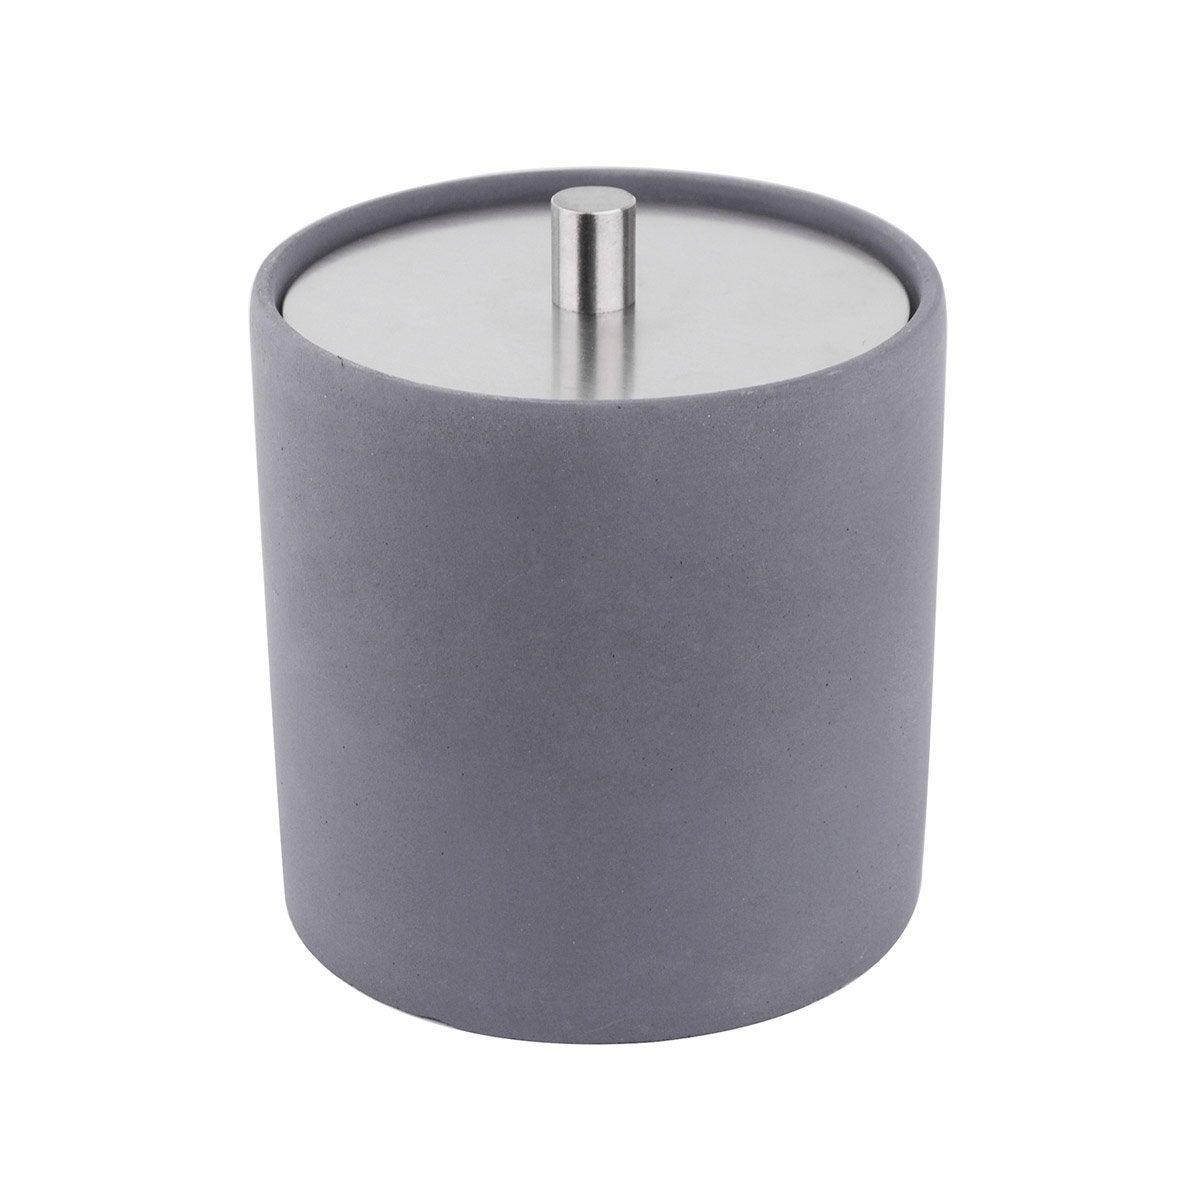 Boîte ciment M apollon dark, gris